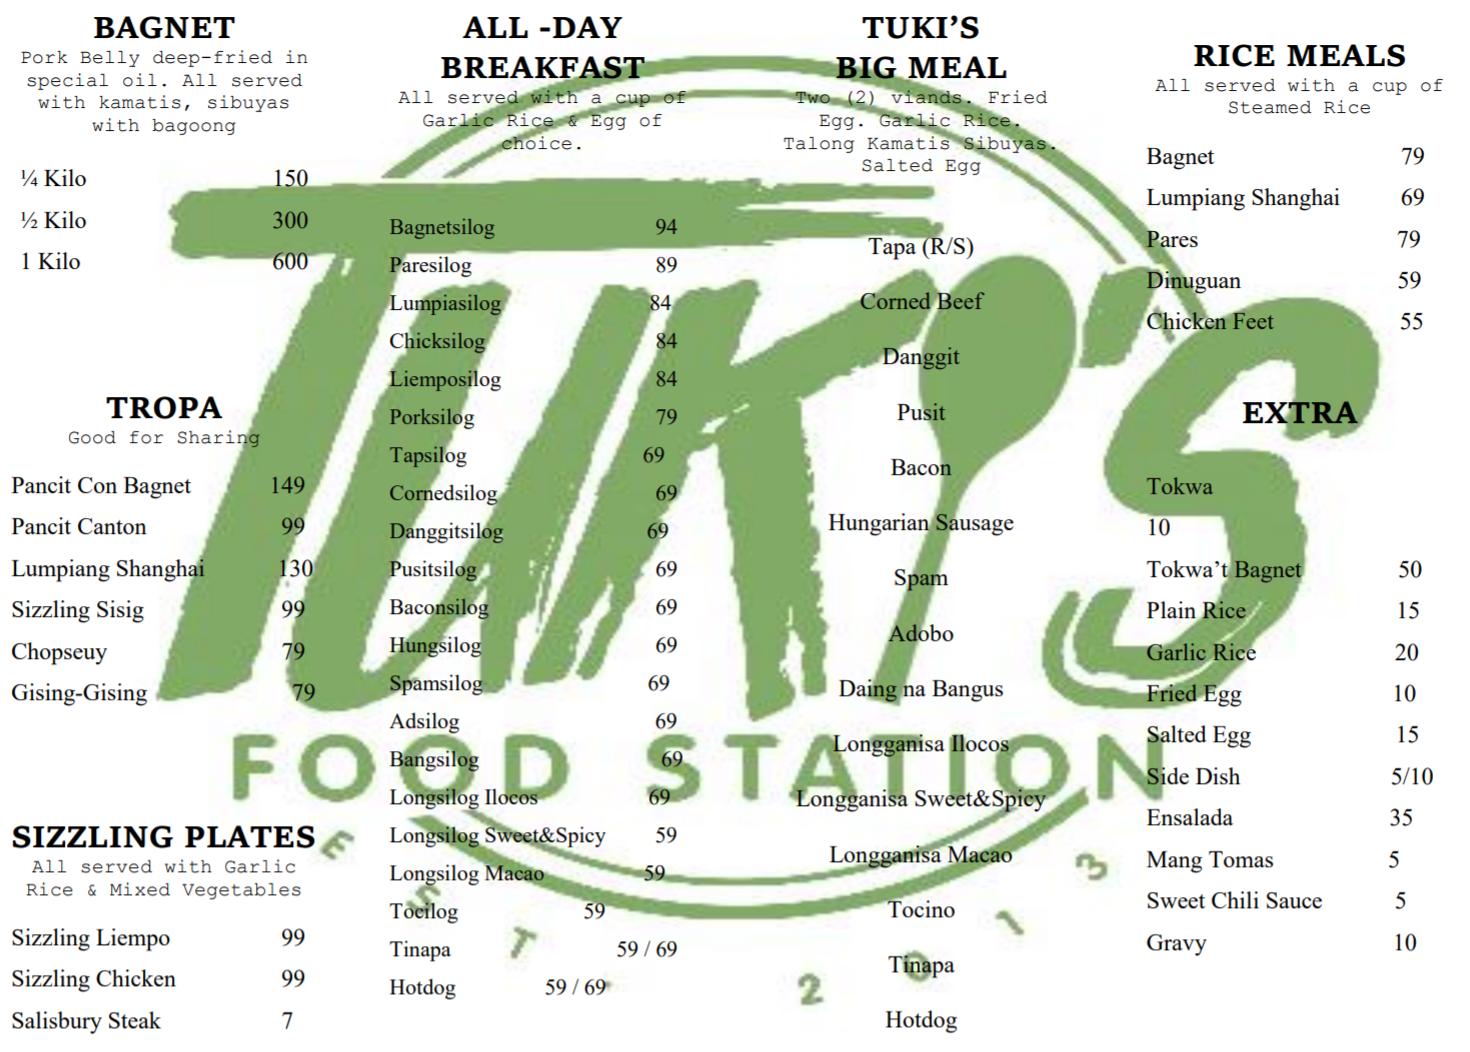 Menu of Tuki's Food Station in Manggahan, Pasig - WTF Review